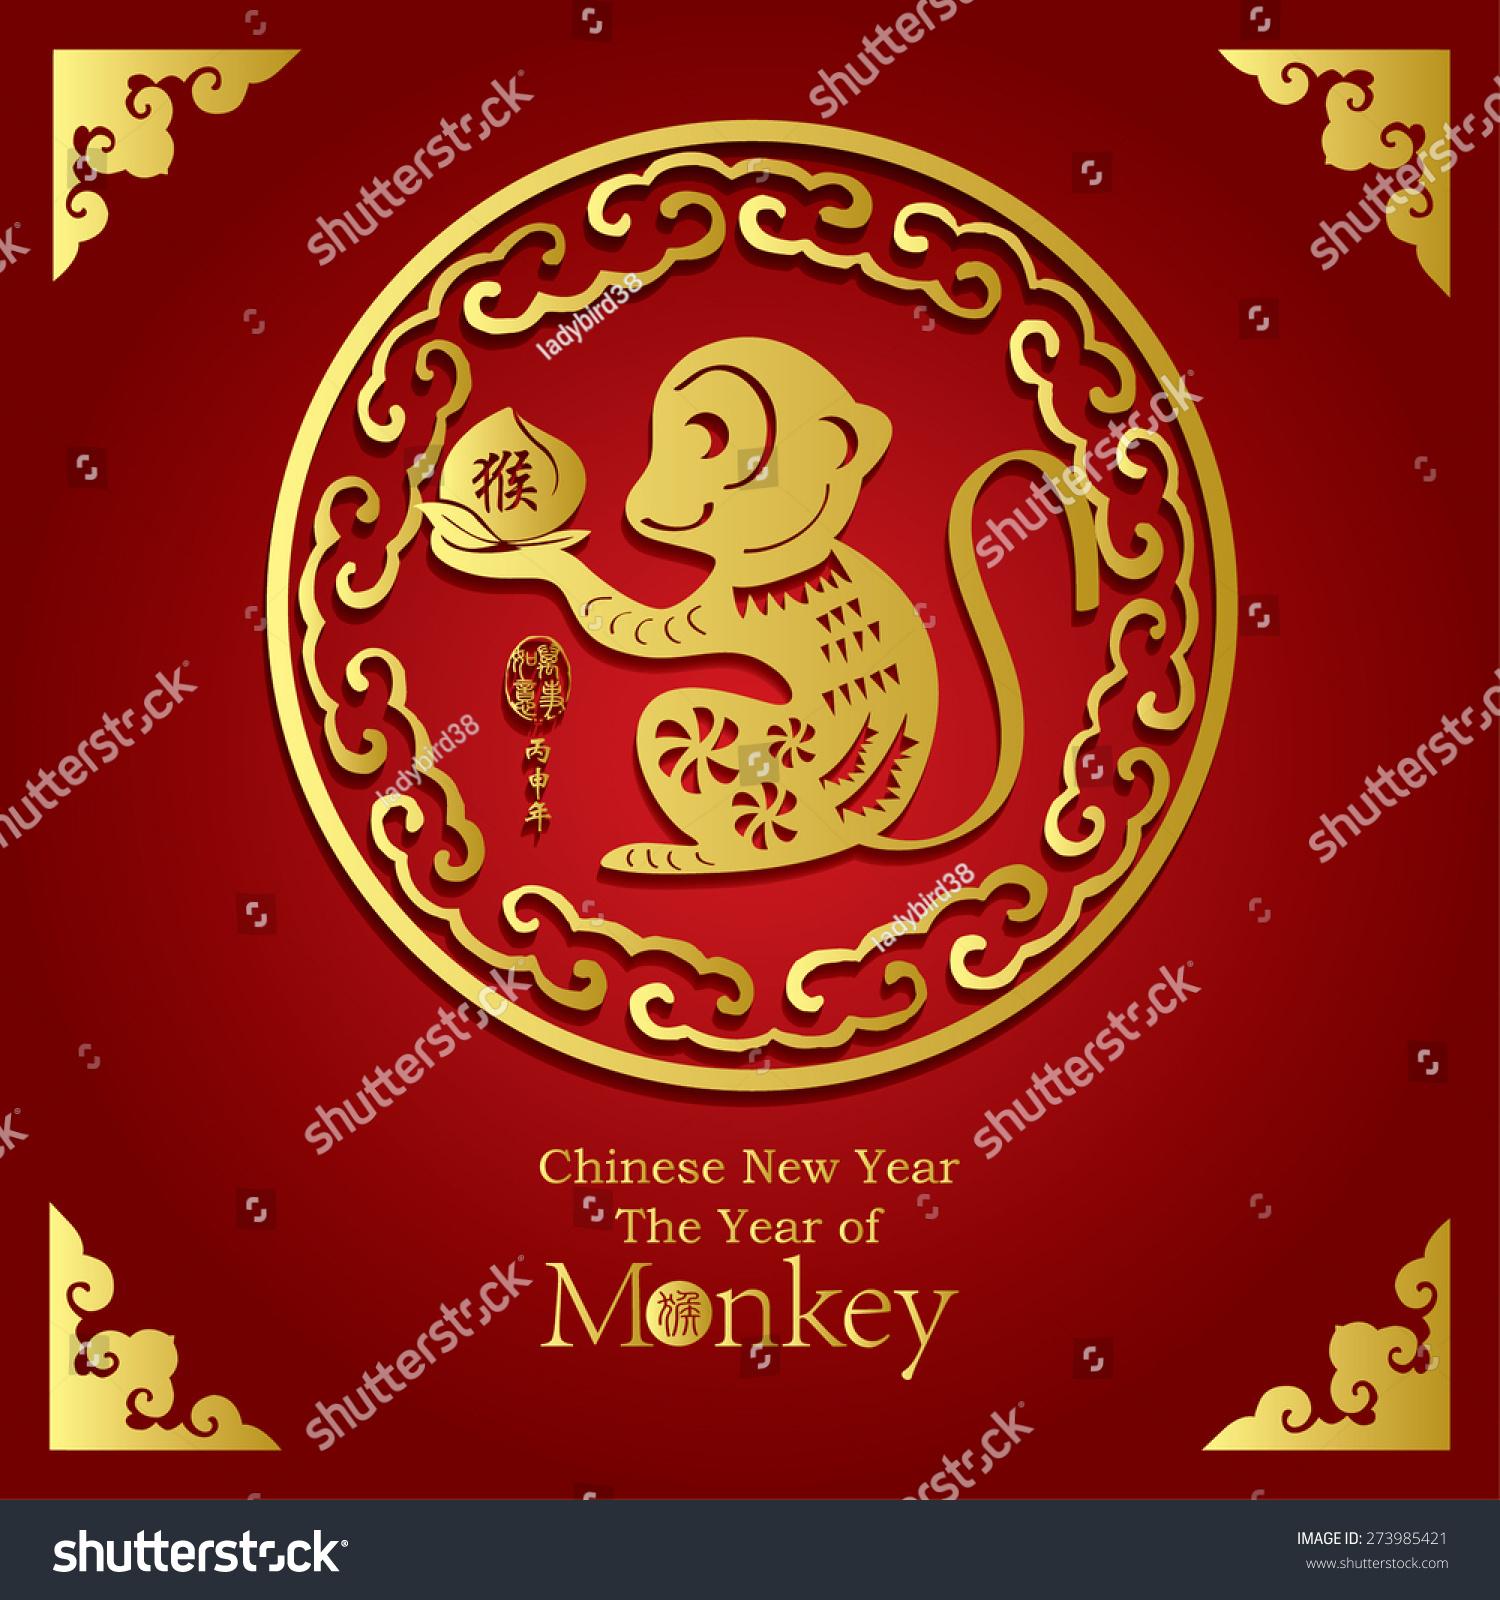 Chinese Zodiac Monkey Translation Small Text Stock Vector ...